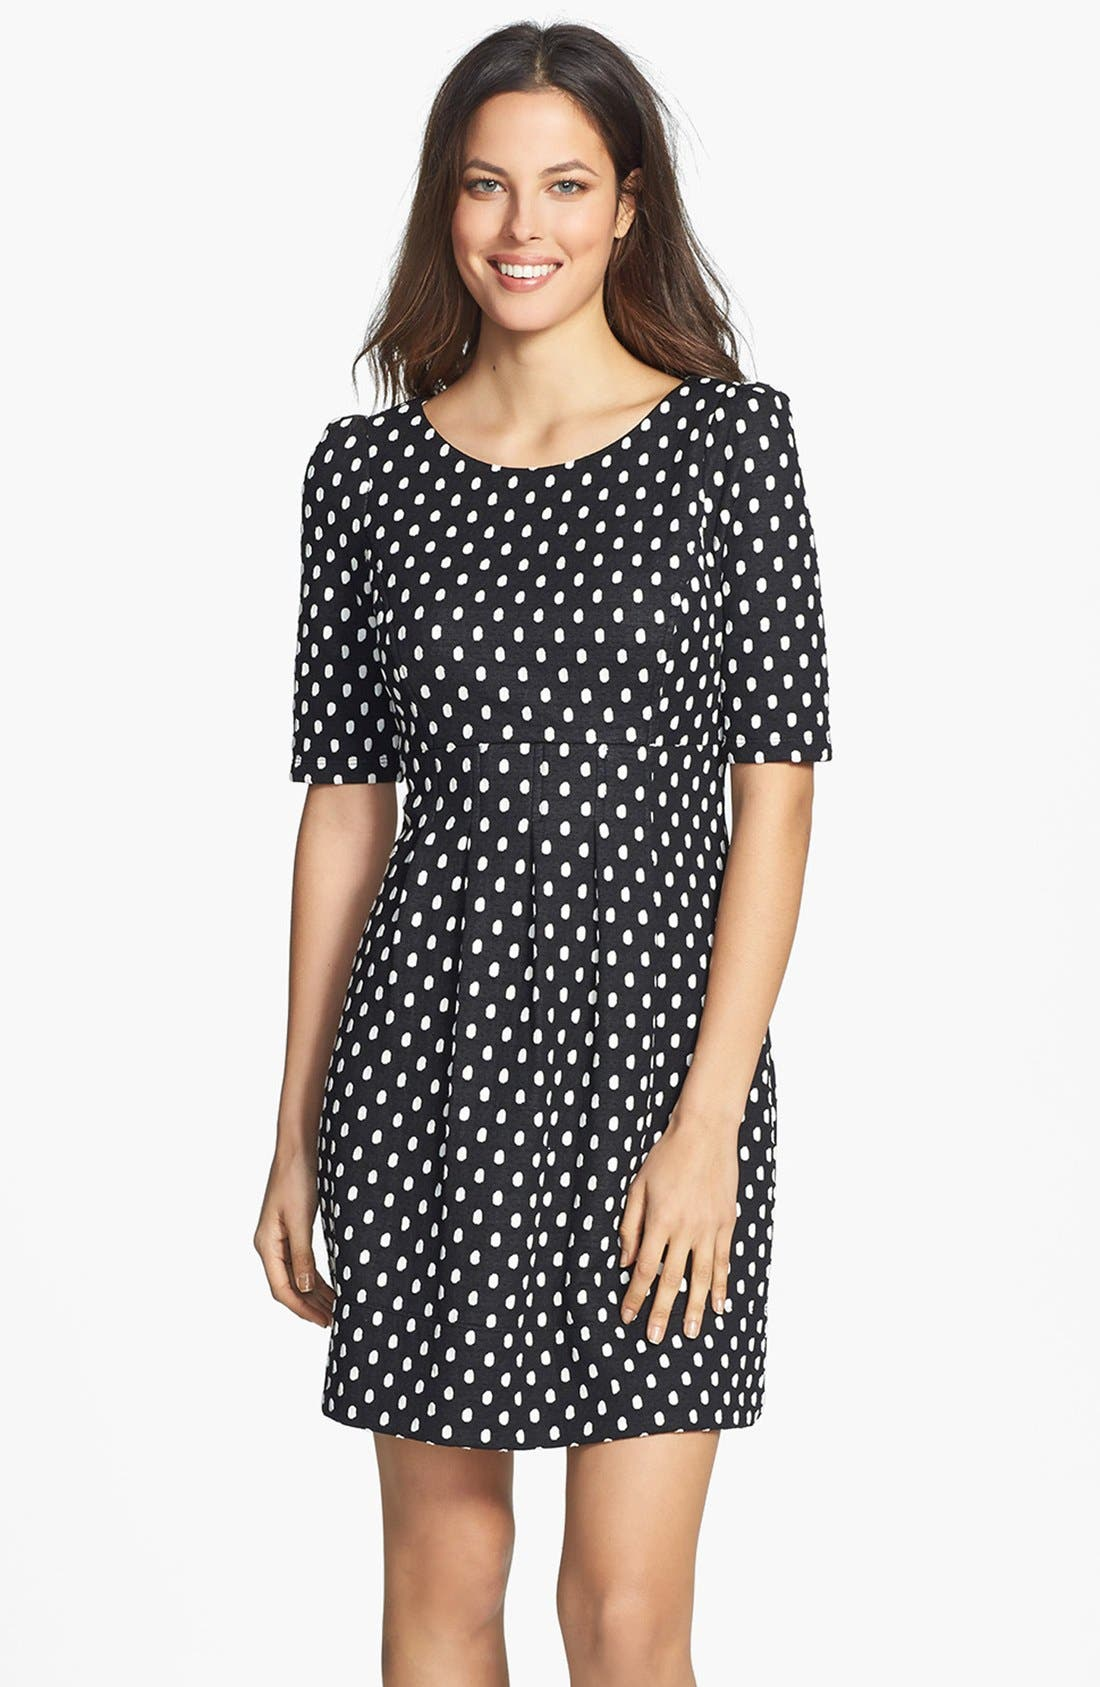 Alternate Image 1 Selected - Donna Ricco Polka Dot Jacquard Dress (Petite)